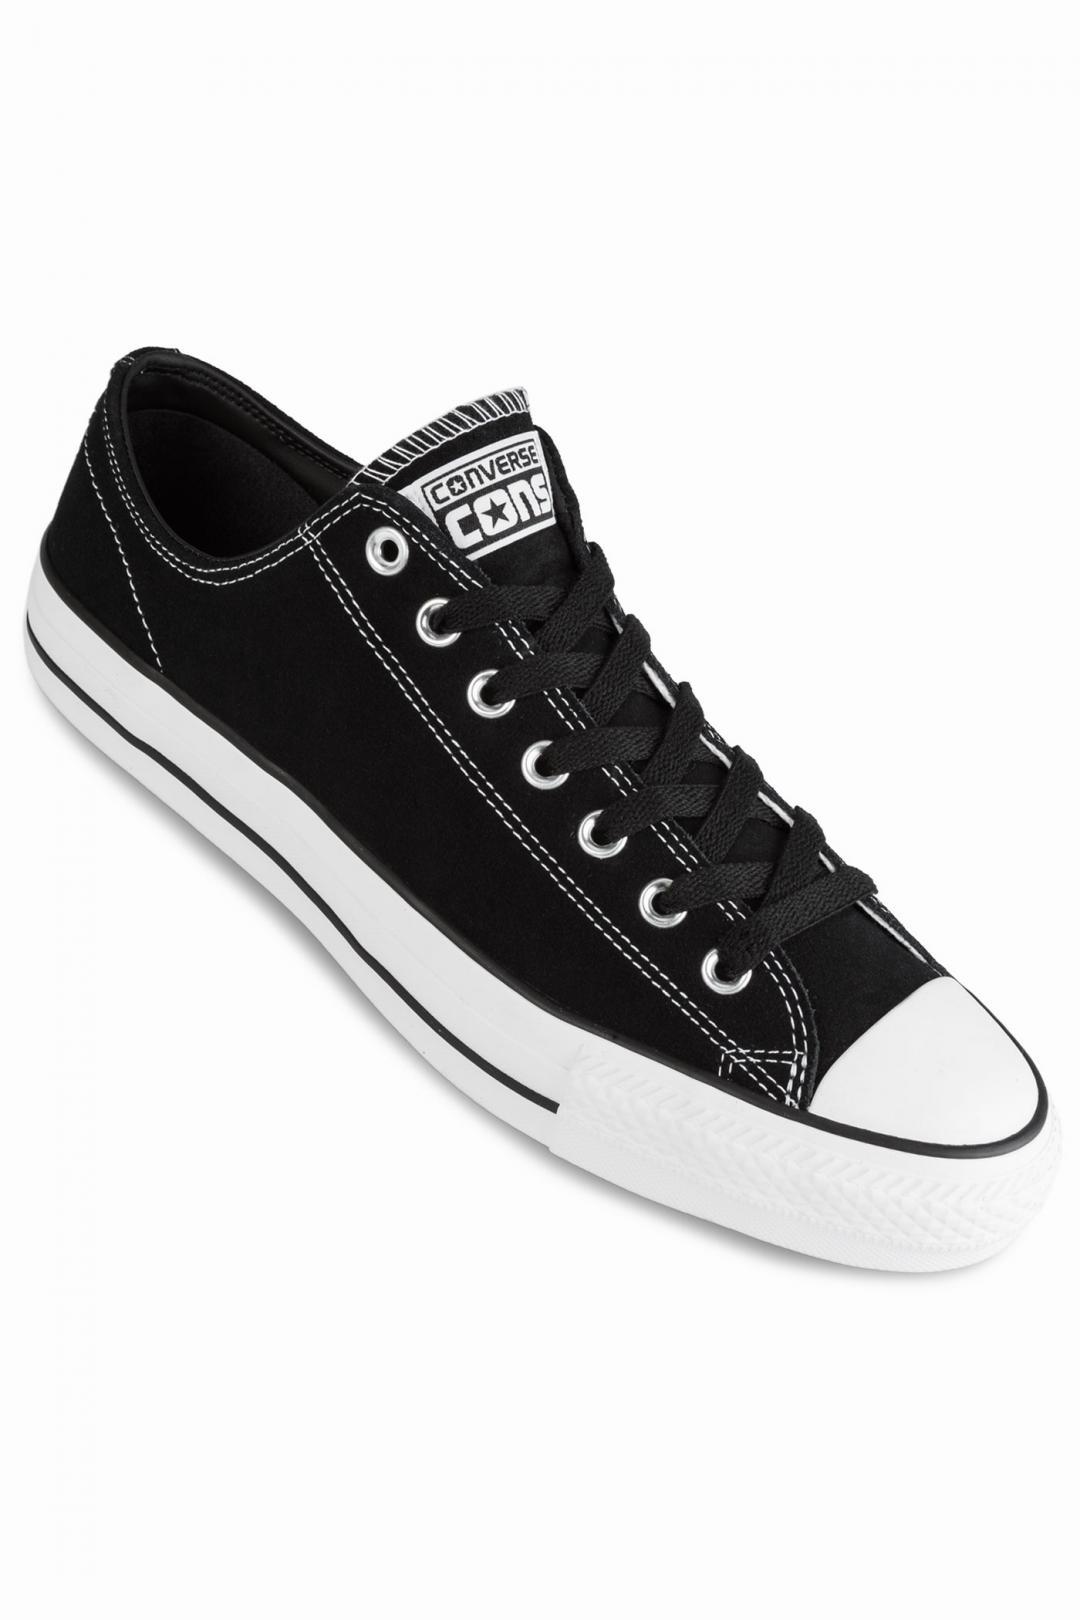 Uomo Converse CONS Chuck Taylor All Star Pro Ox black black white   Sneaker